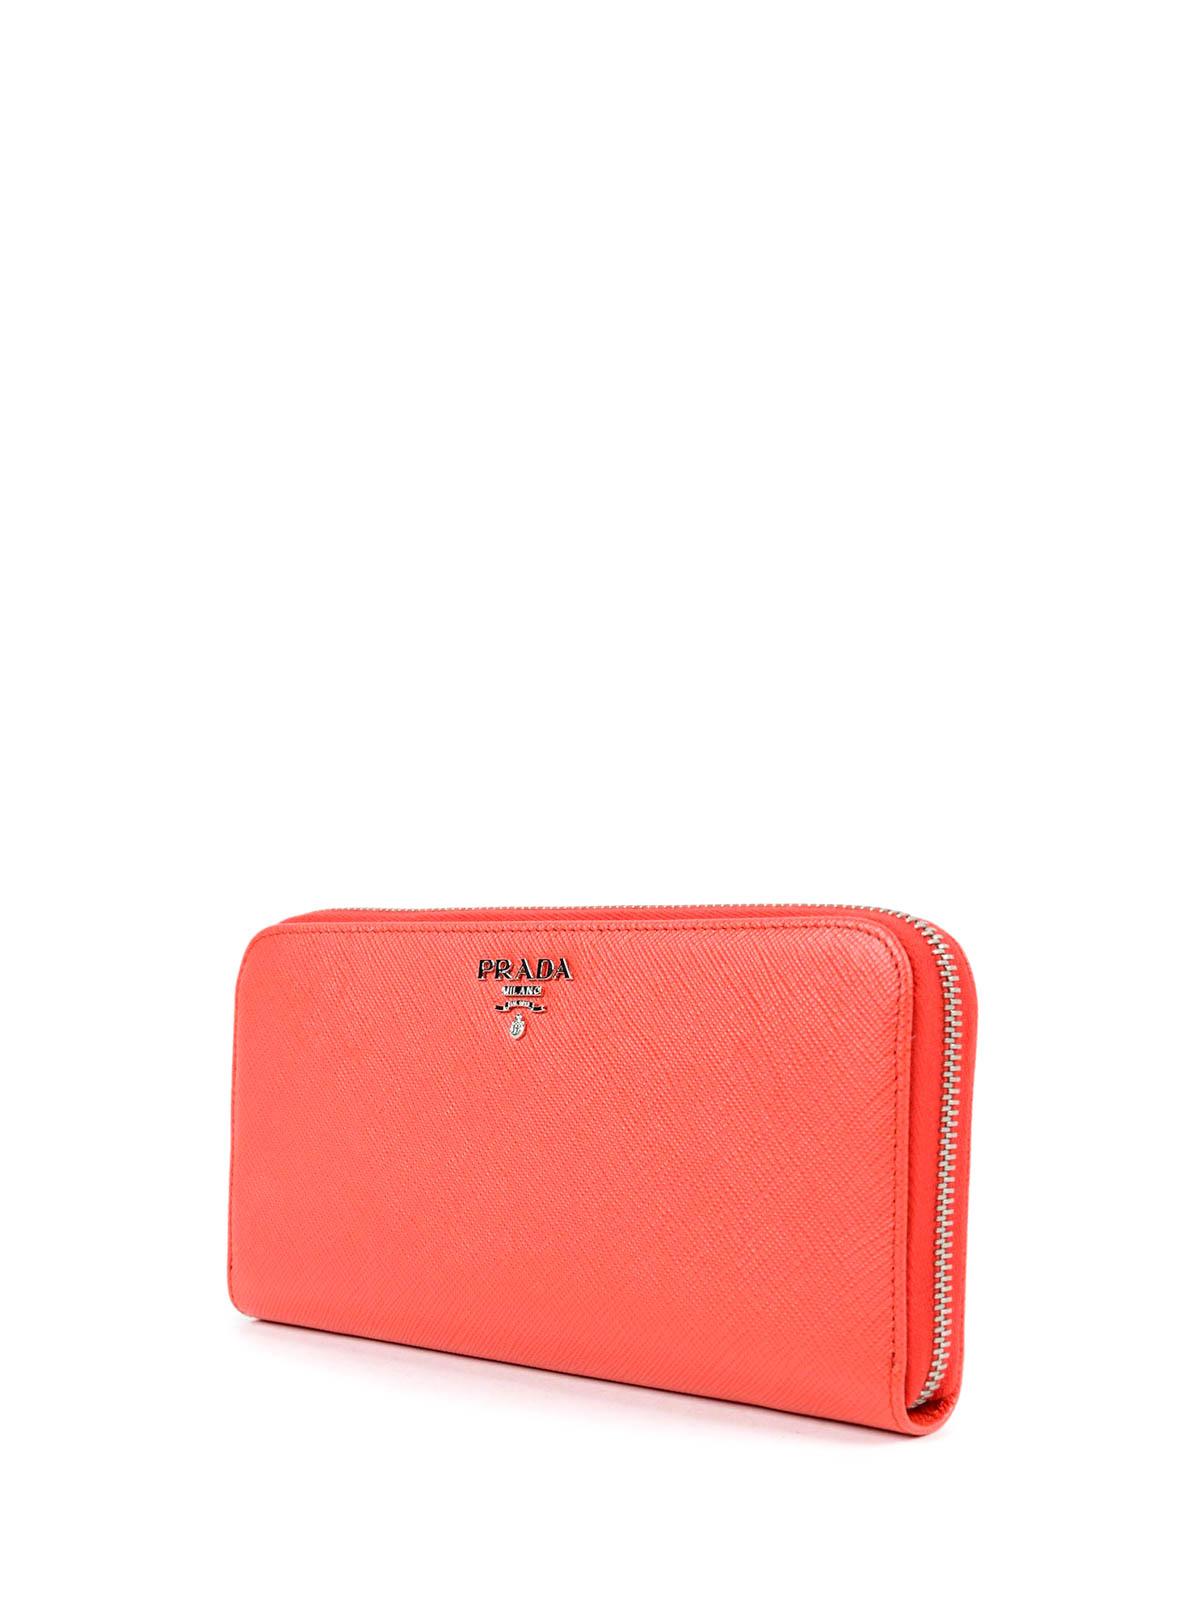 prada clutch purse - Continental leather wallet by Prada - wallets & purses | iKRIX